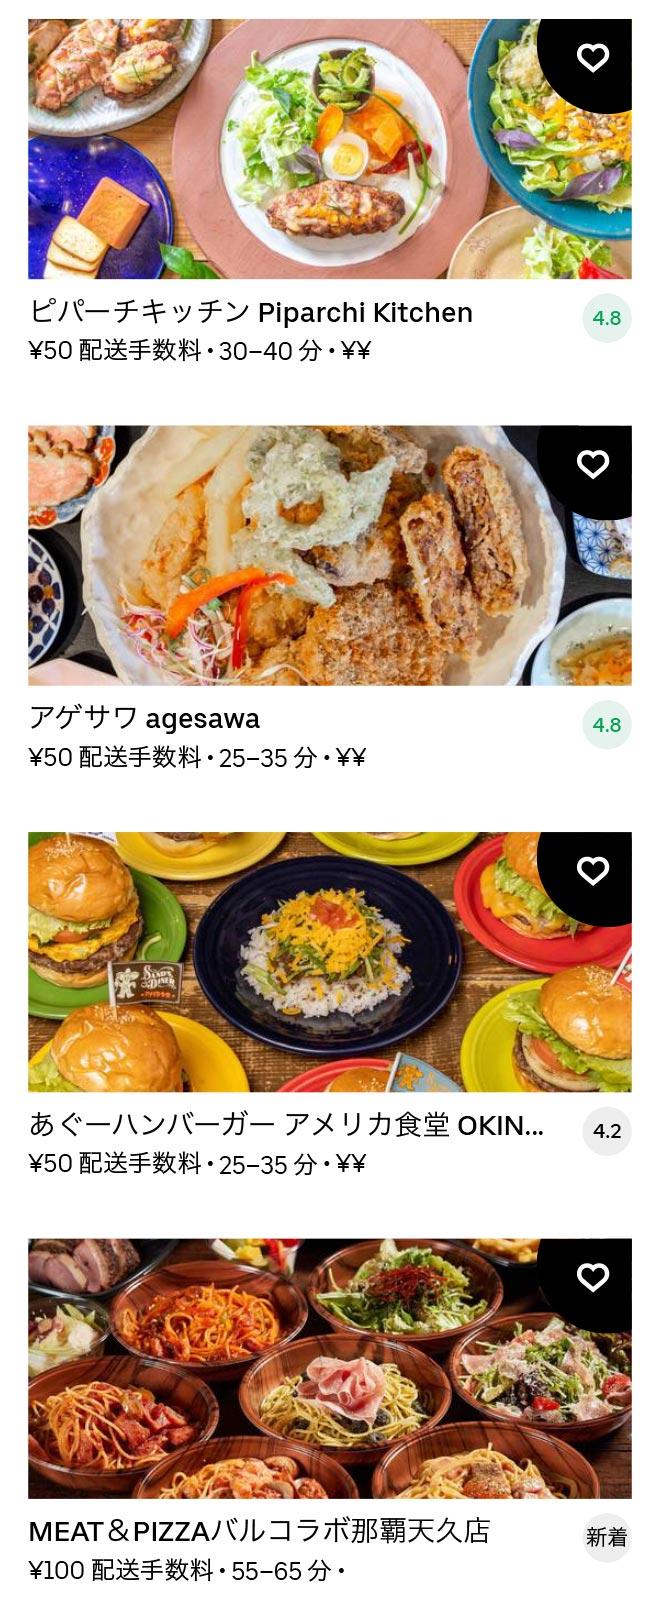 O kenchomae menu 2011 09